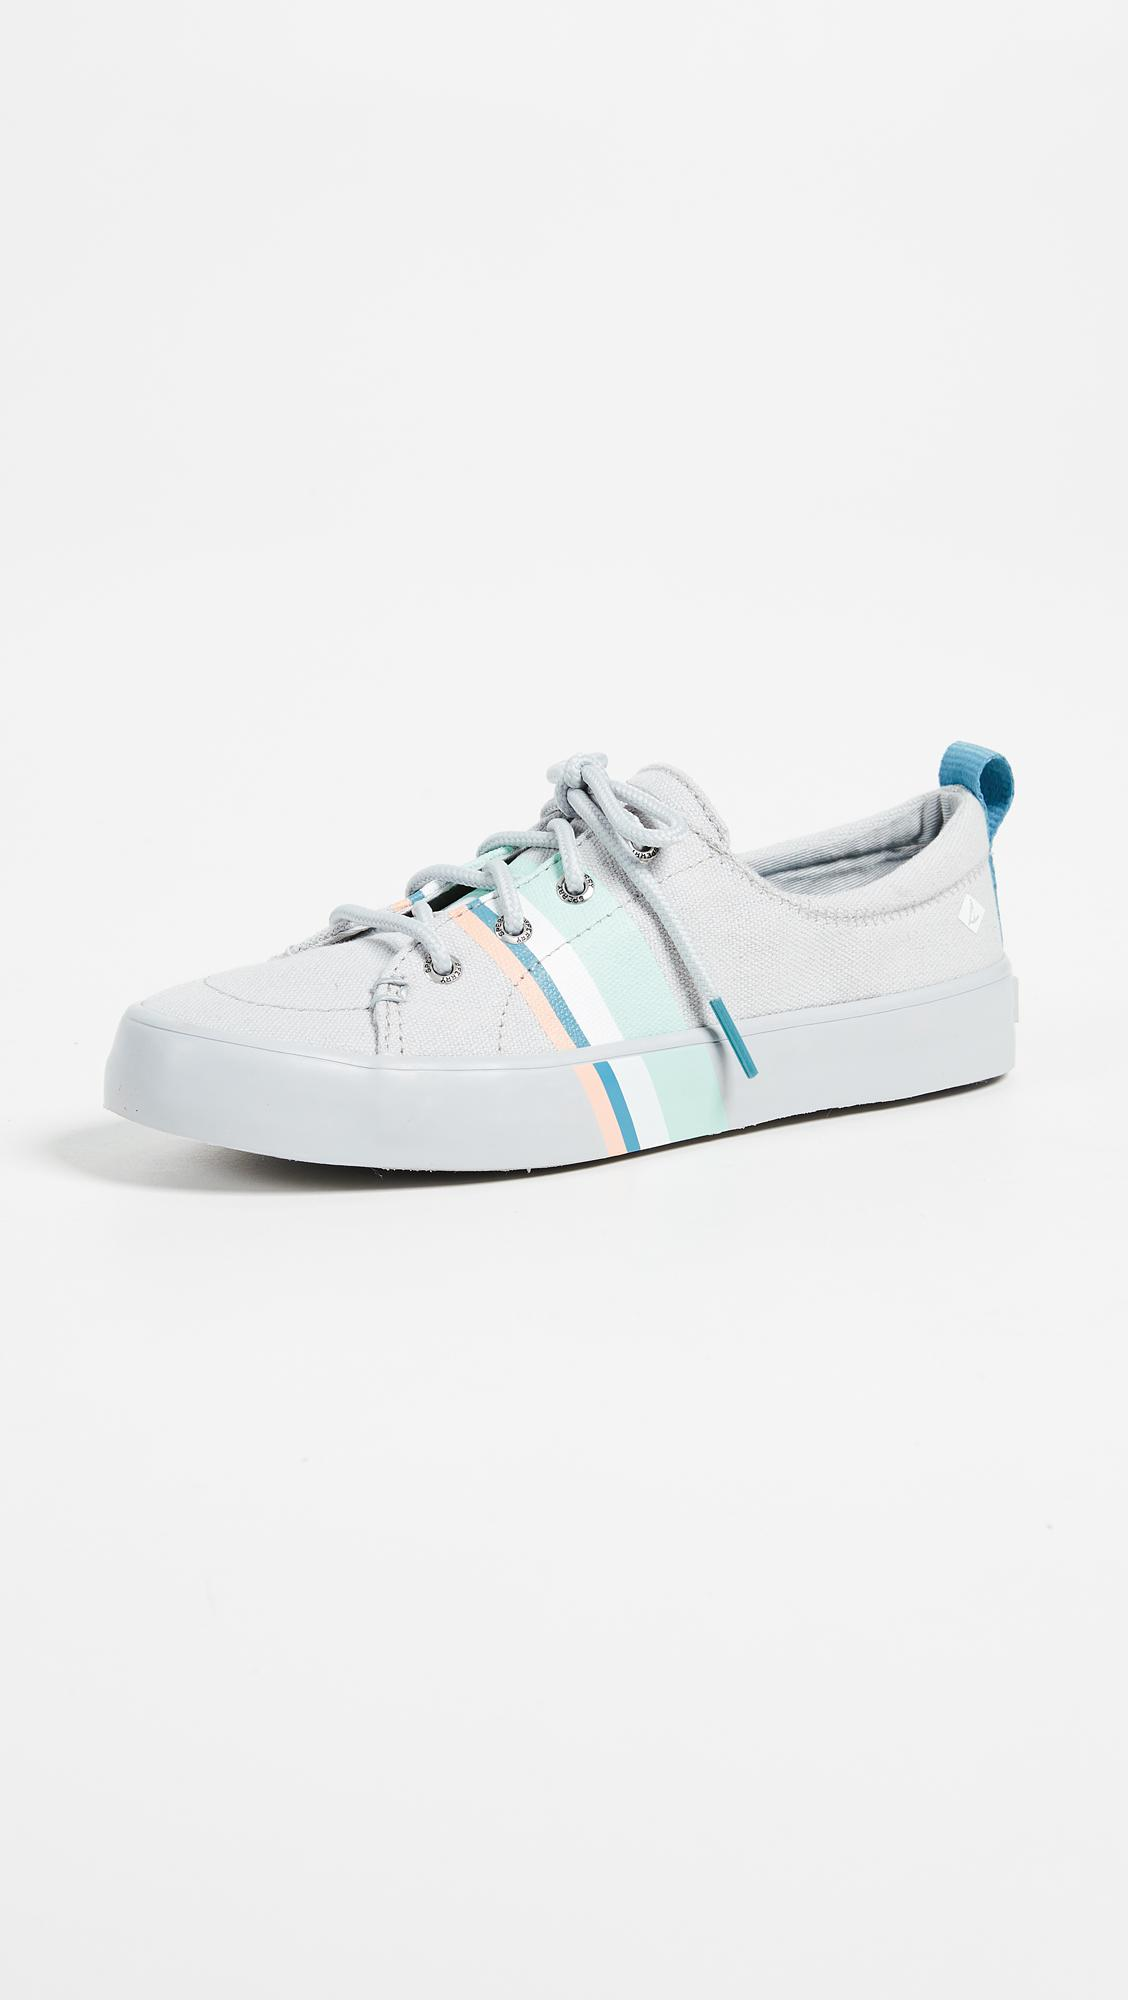 Crest Vibe Buoy Sneakers PzkjbxfL